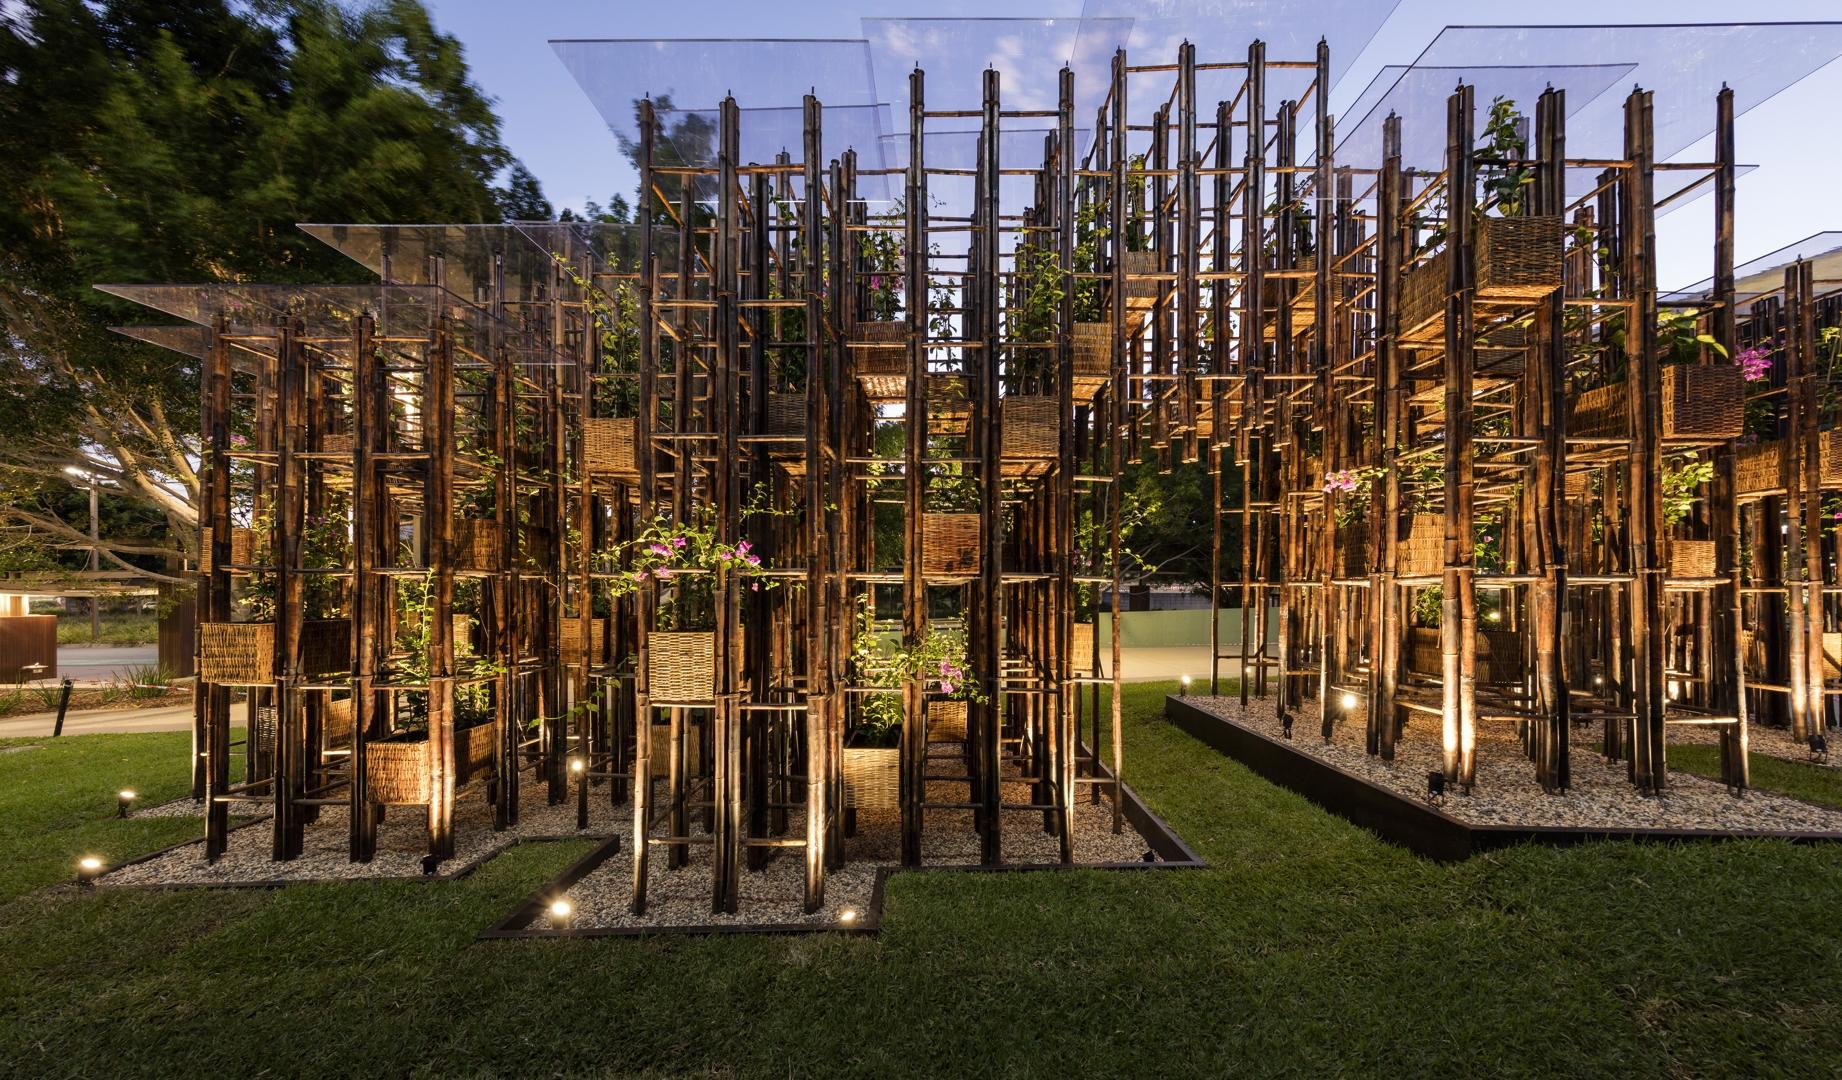 Green Ladder: Vo Trong Nghia image